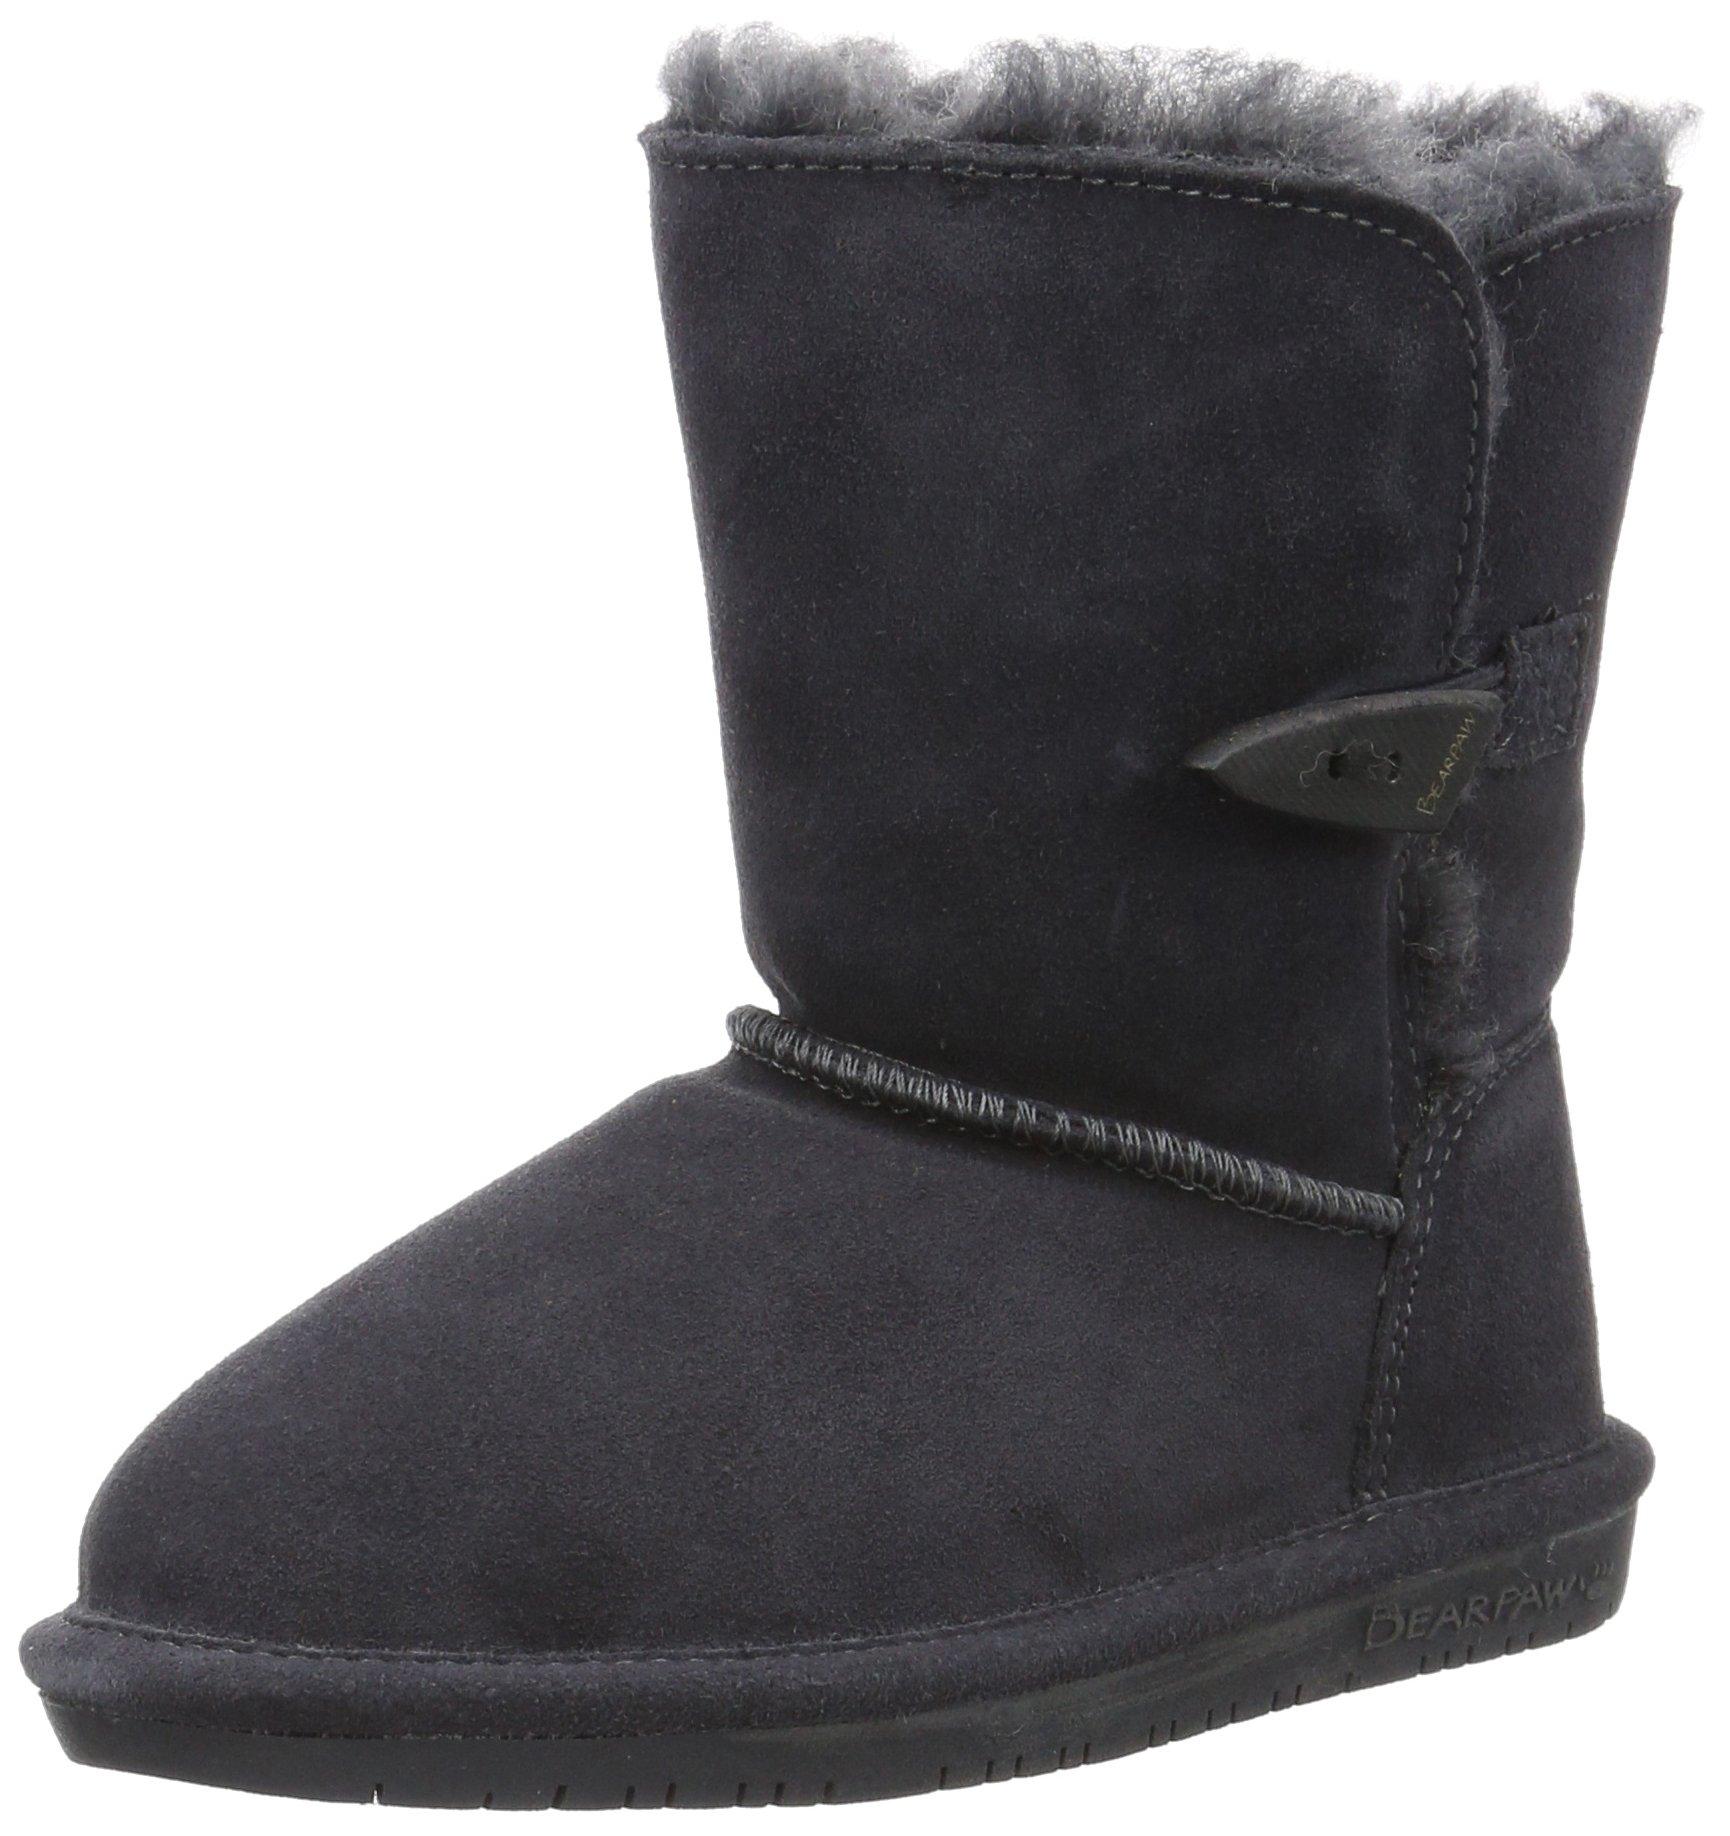 Bearpaw Abigail Charcoal Unisex Kids Shearling Boot Size 1M